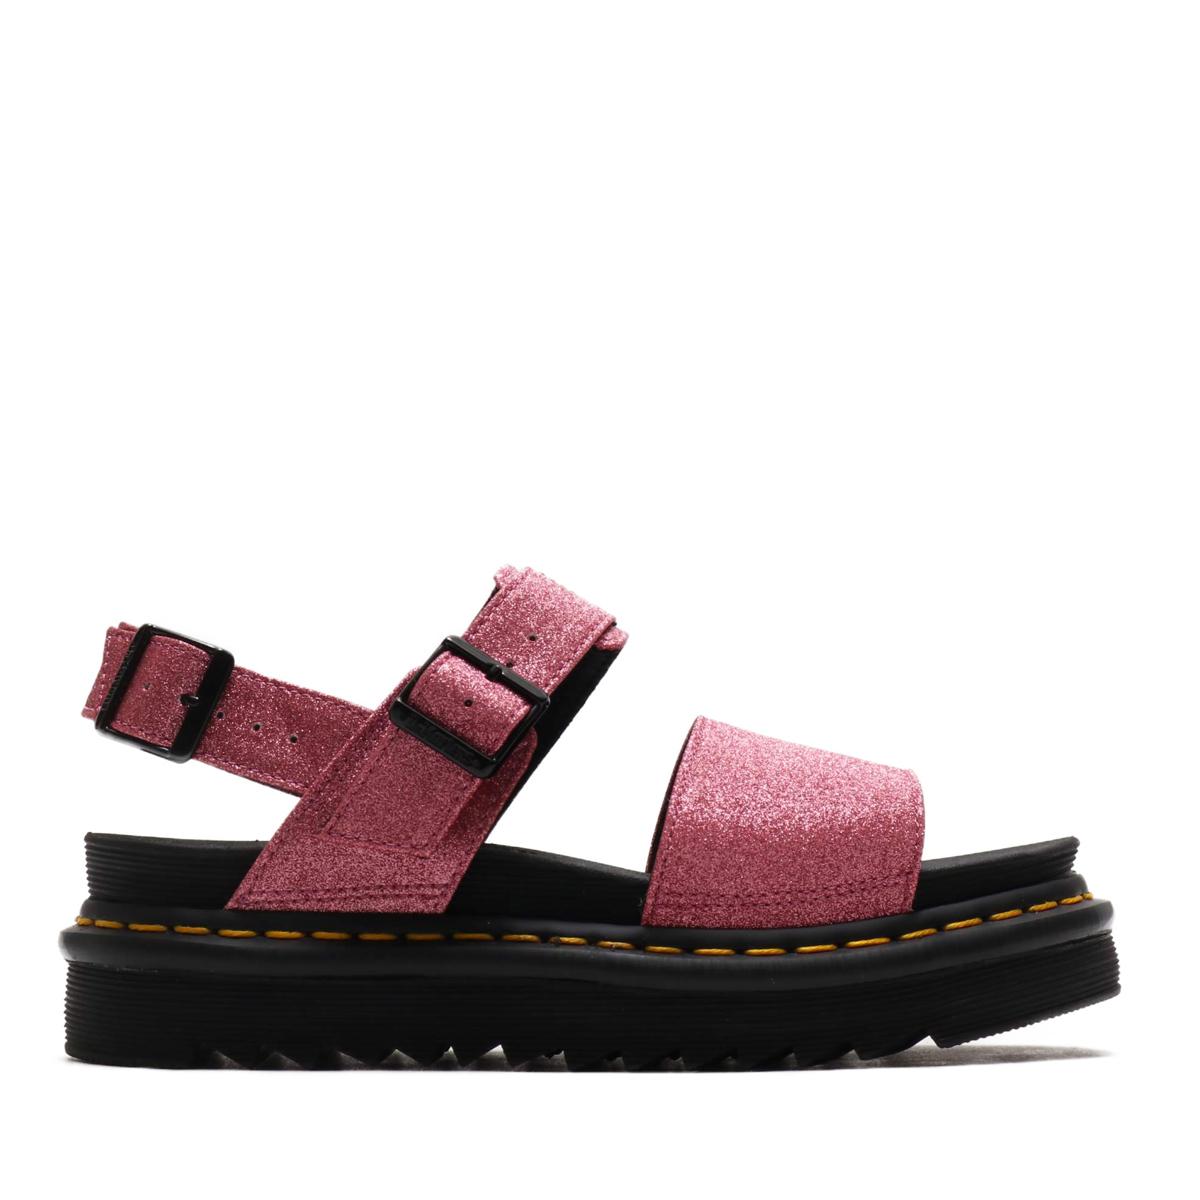 Dr.Martens Voss Strap Sandal(Pink Fine Glitter Pu)(ドクターマーチン ボス ストラップ サンダル)【レディース】【サンダル】【19SS-I】